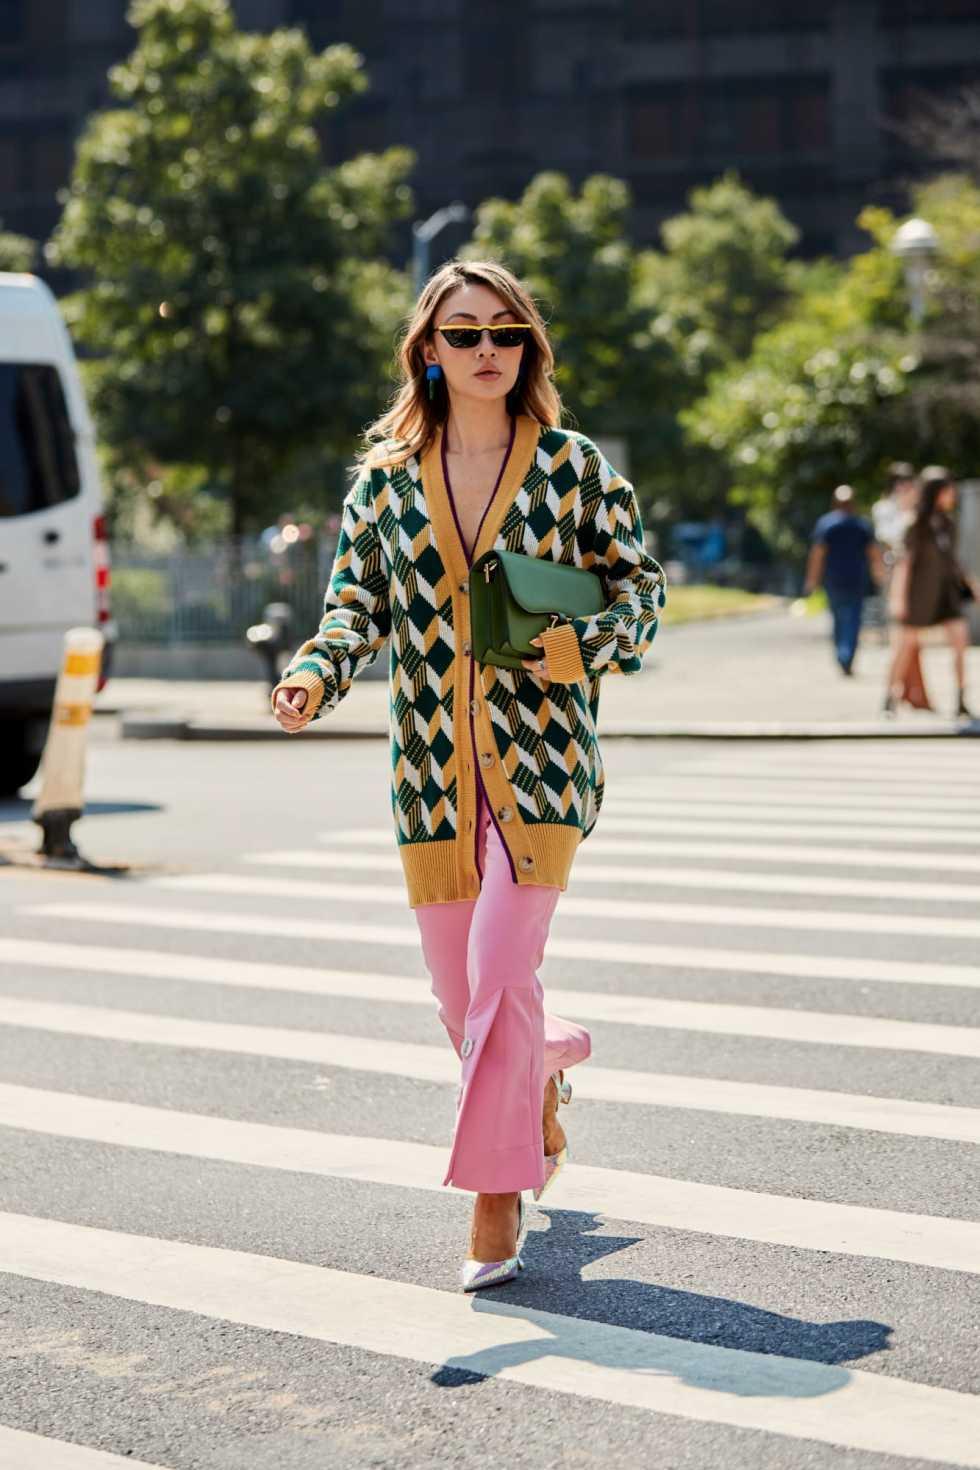 new-york-fashion-week-street-style-spring-2019-day-1-42